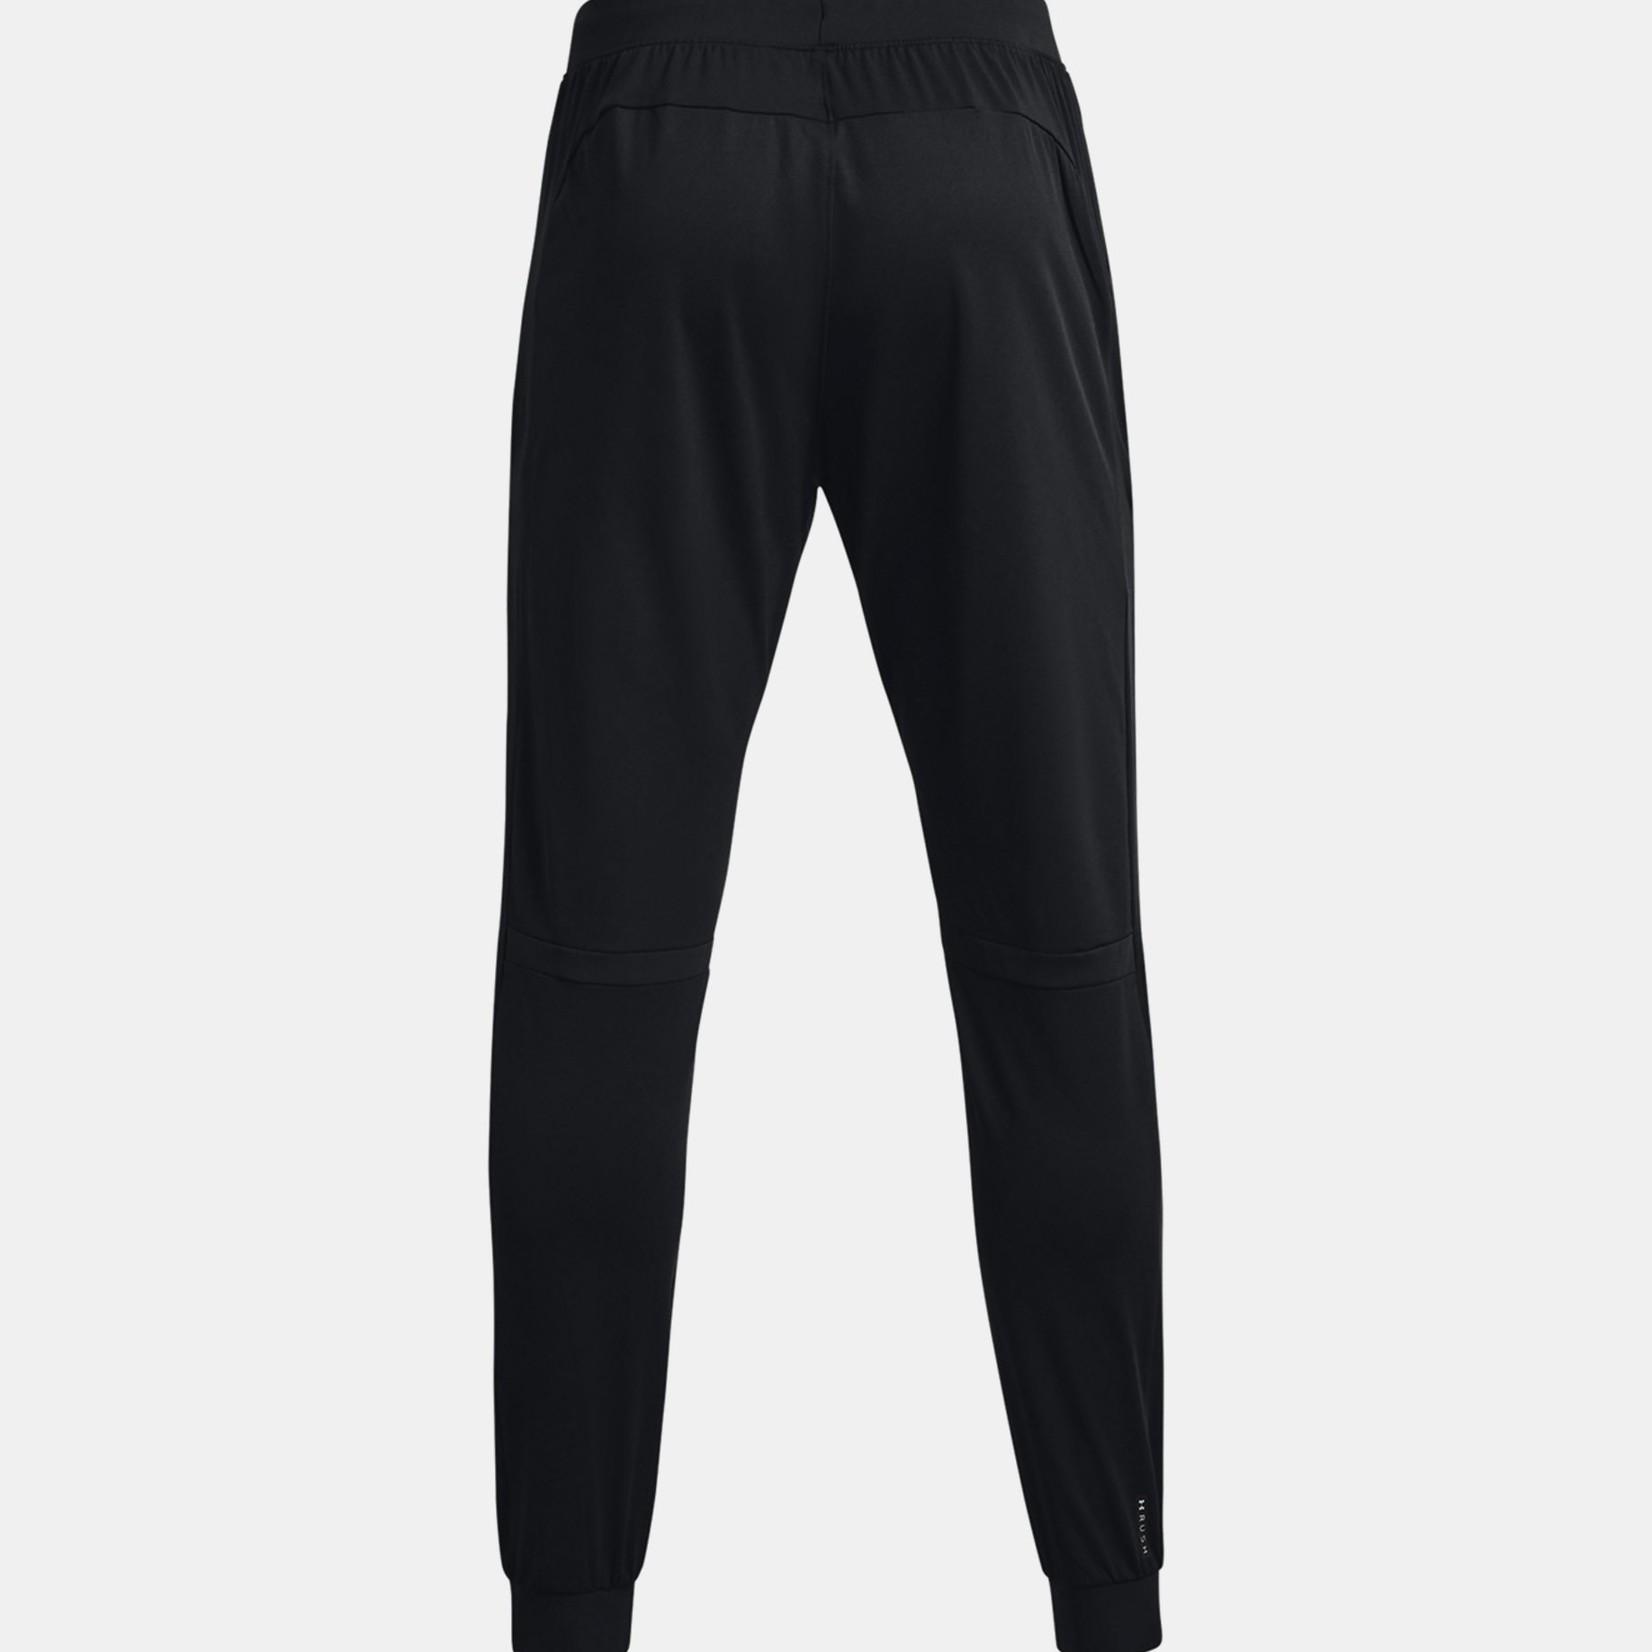 Under Armour UA Rush All Purpose Pants-Black